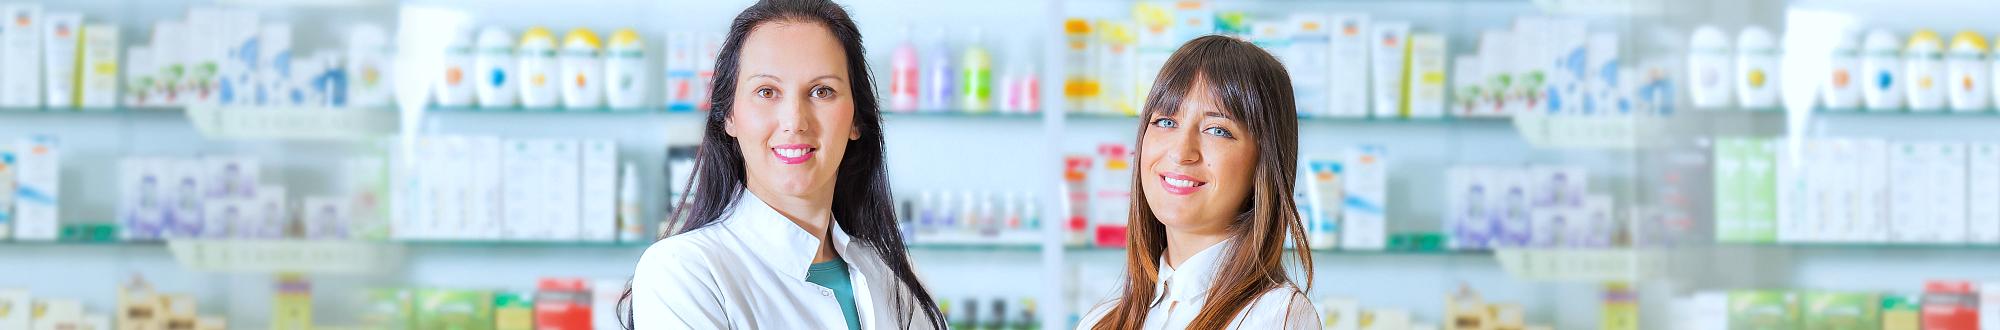 two female pharmacist smiling